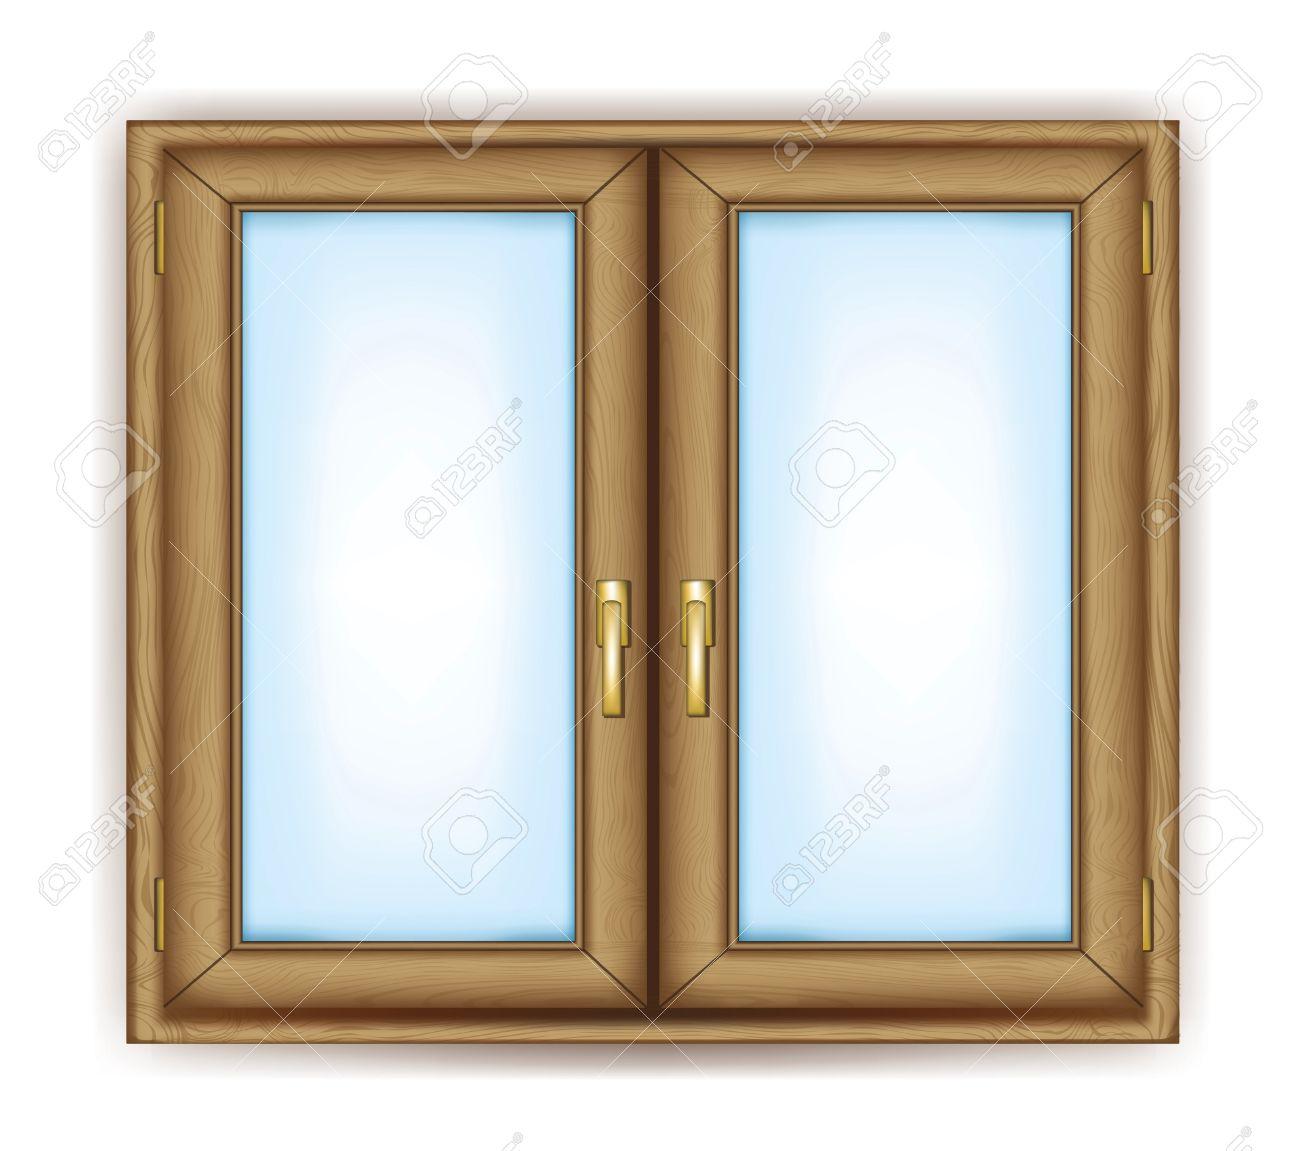 Fenster geschlossen clipart  Geschlossene Fenster Mit Gold Verarbeitet Vektor- Lizenzfrei ...